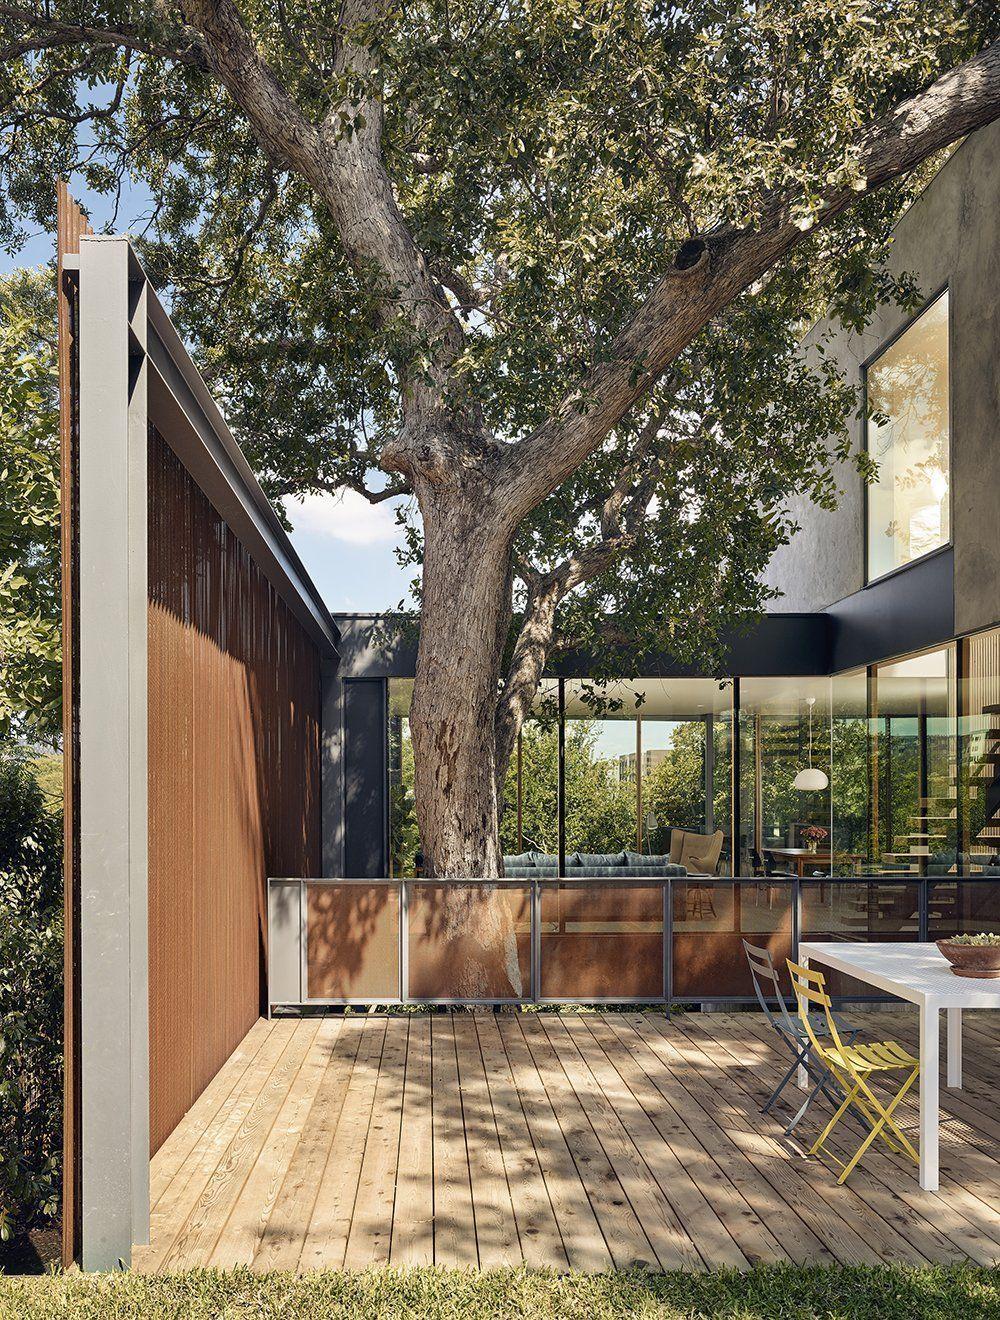 4 Wondrous Useful Tips Fence Planters Ana White Dog Garage Fix Old Premade Panels